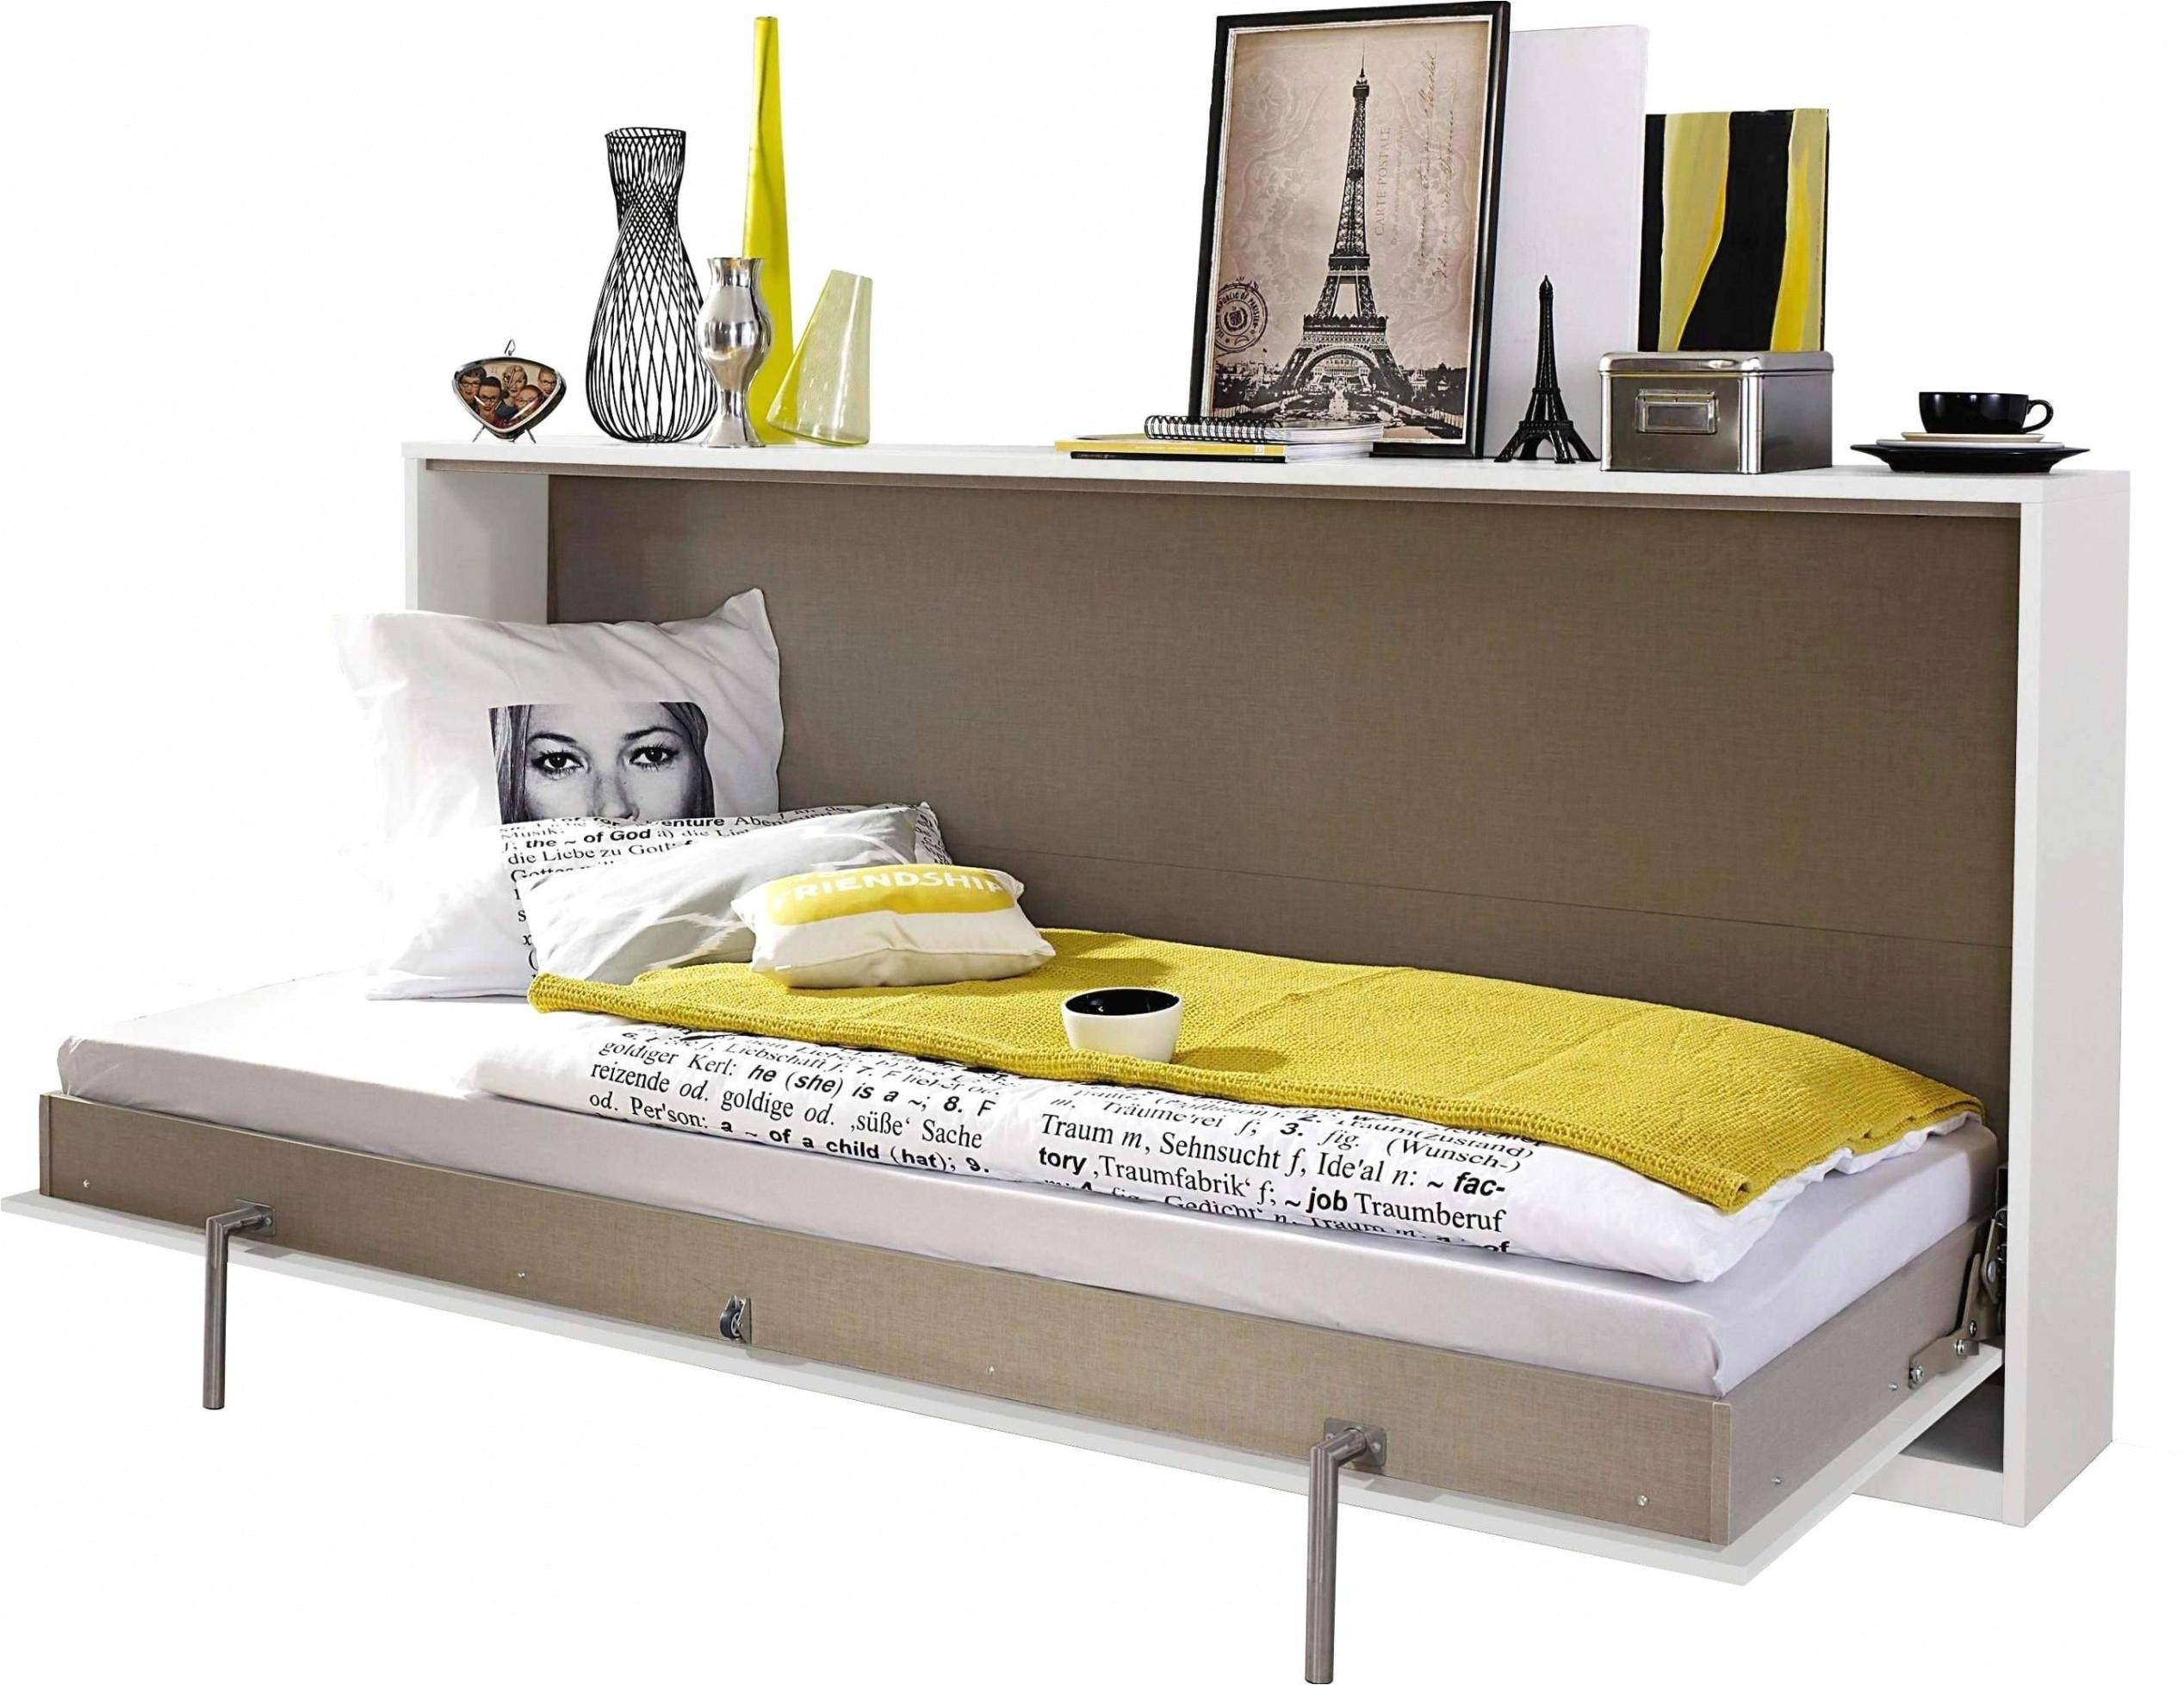 Hemnes Twin Bed Inspirational Bed Frame for Foam Mattress Ideas — Melthphx